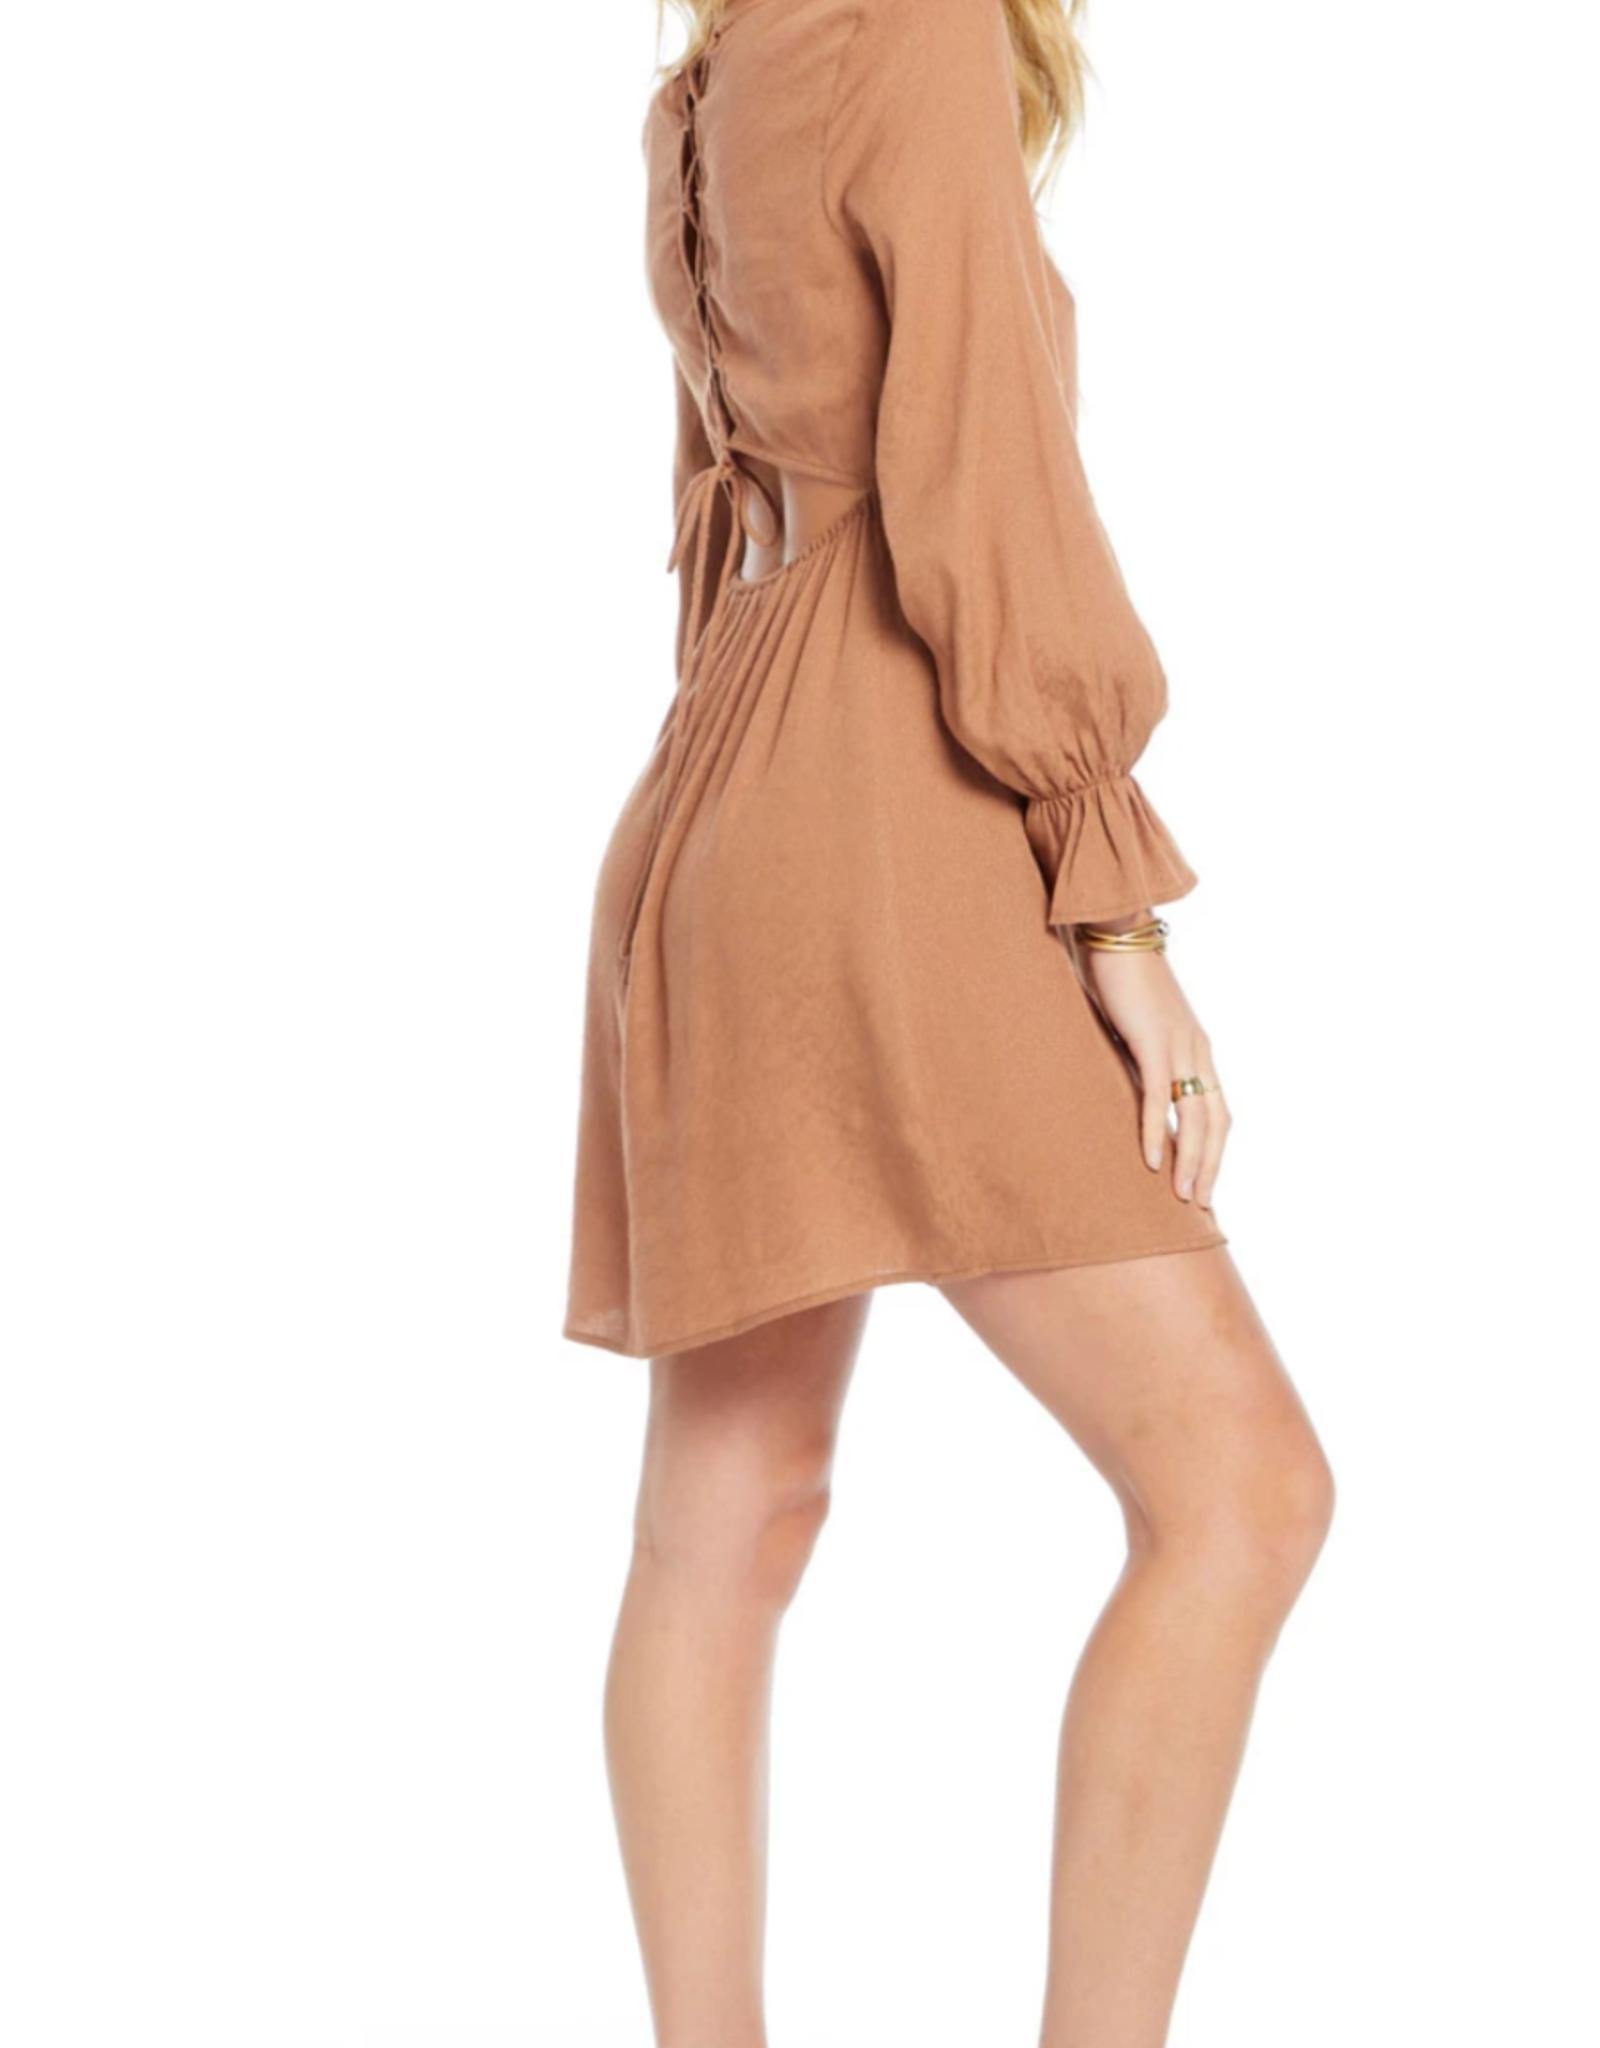 Ciao Bella Back Lace Up Mini Dress